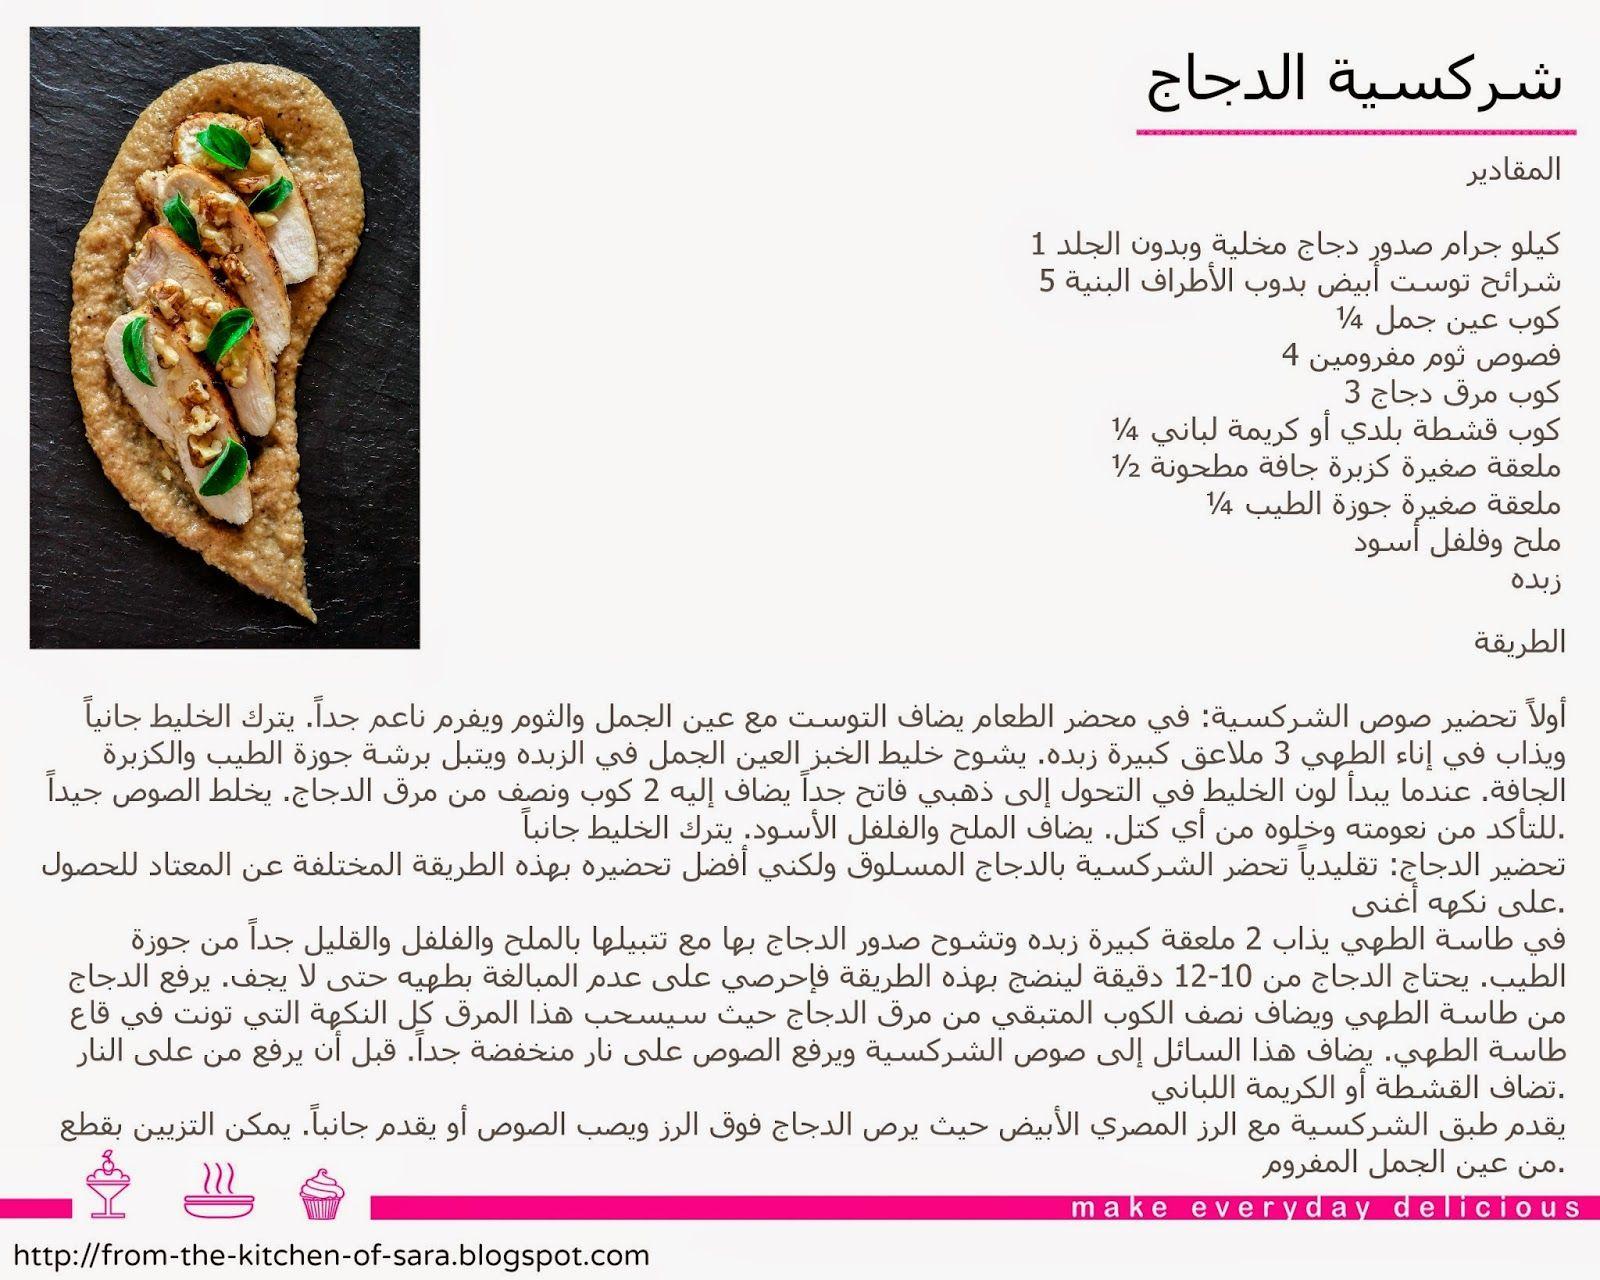 Sara\'s Kitchen: Chicken Sharkaseya شركسية الدجاج | food | Pinterest ...